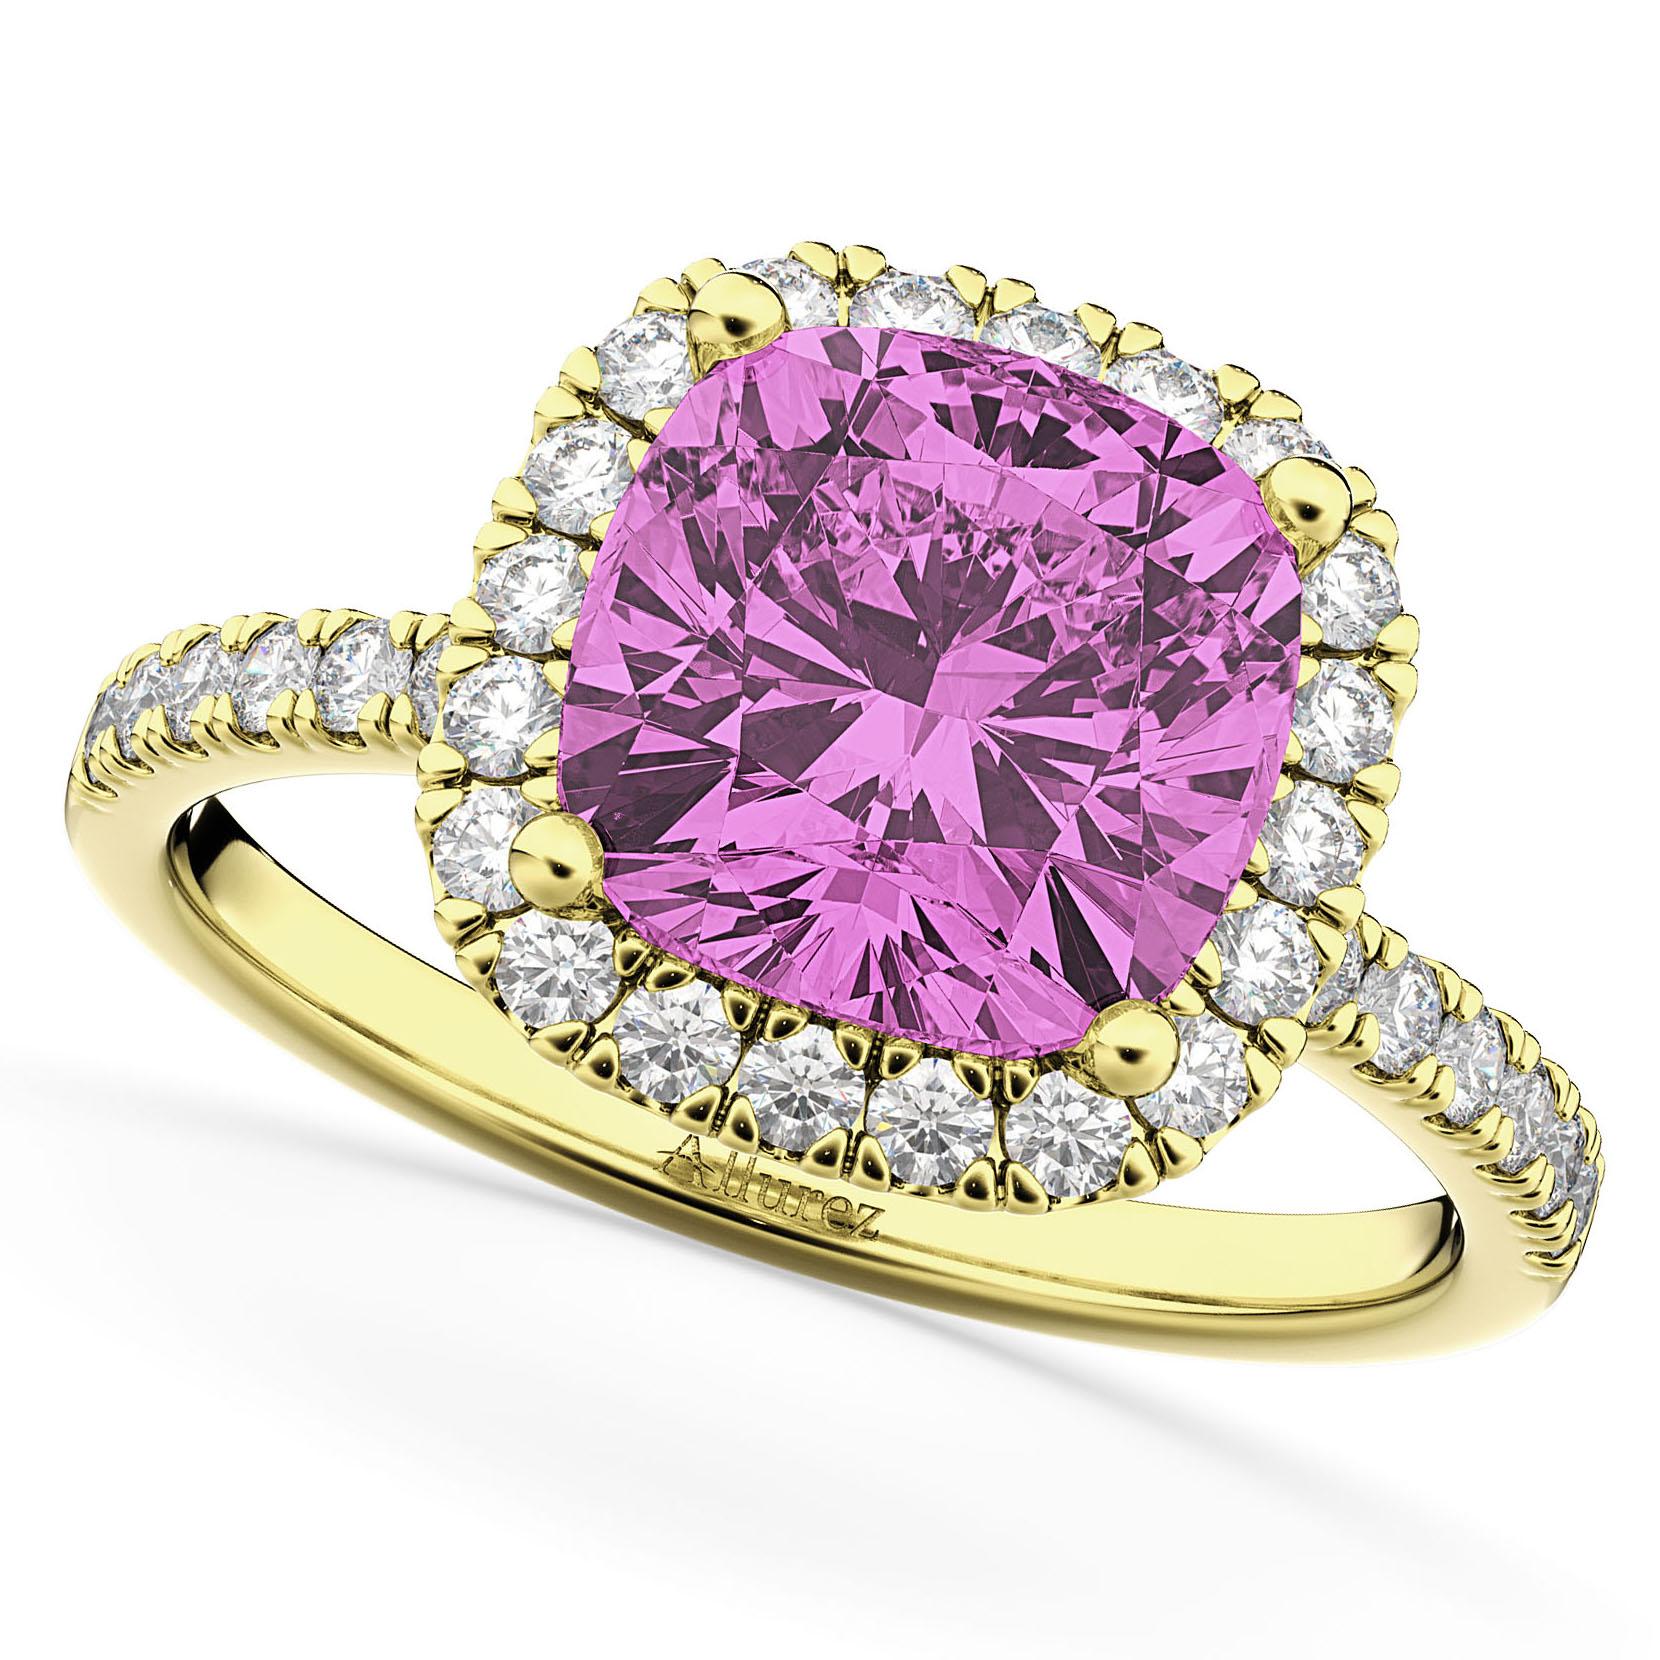 Cushion Cut Halo Pink Sapphire & Diamond Engagement Ring 14k Yellow Gold (3.11ct)